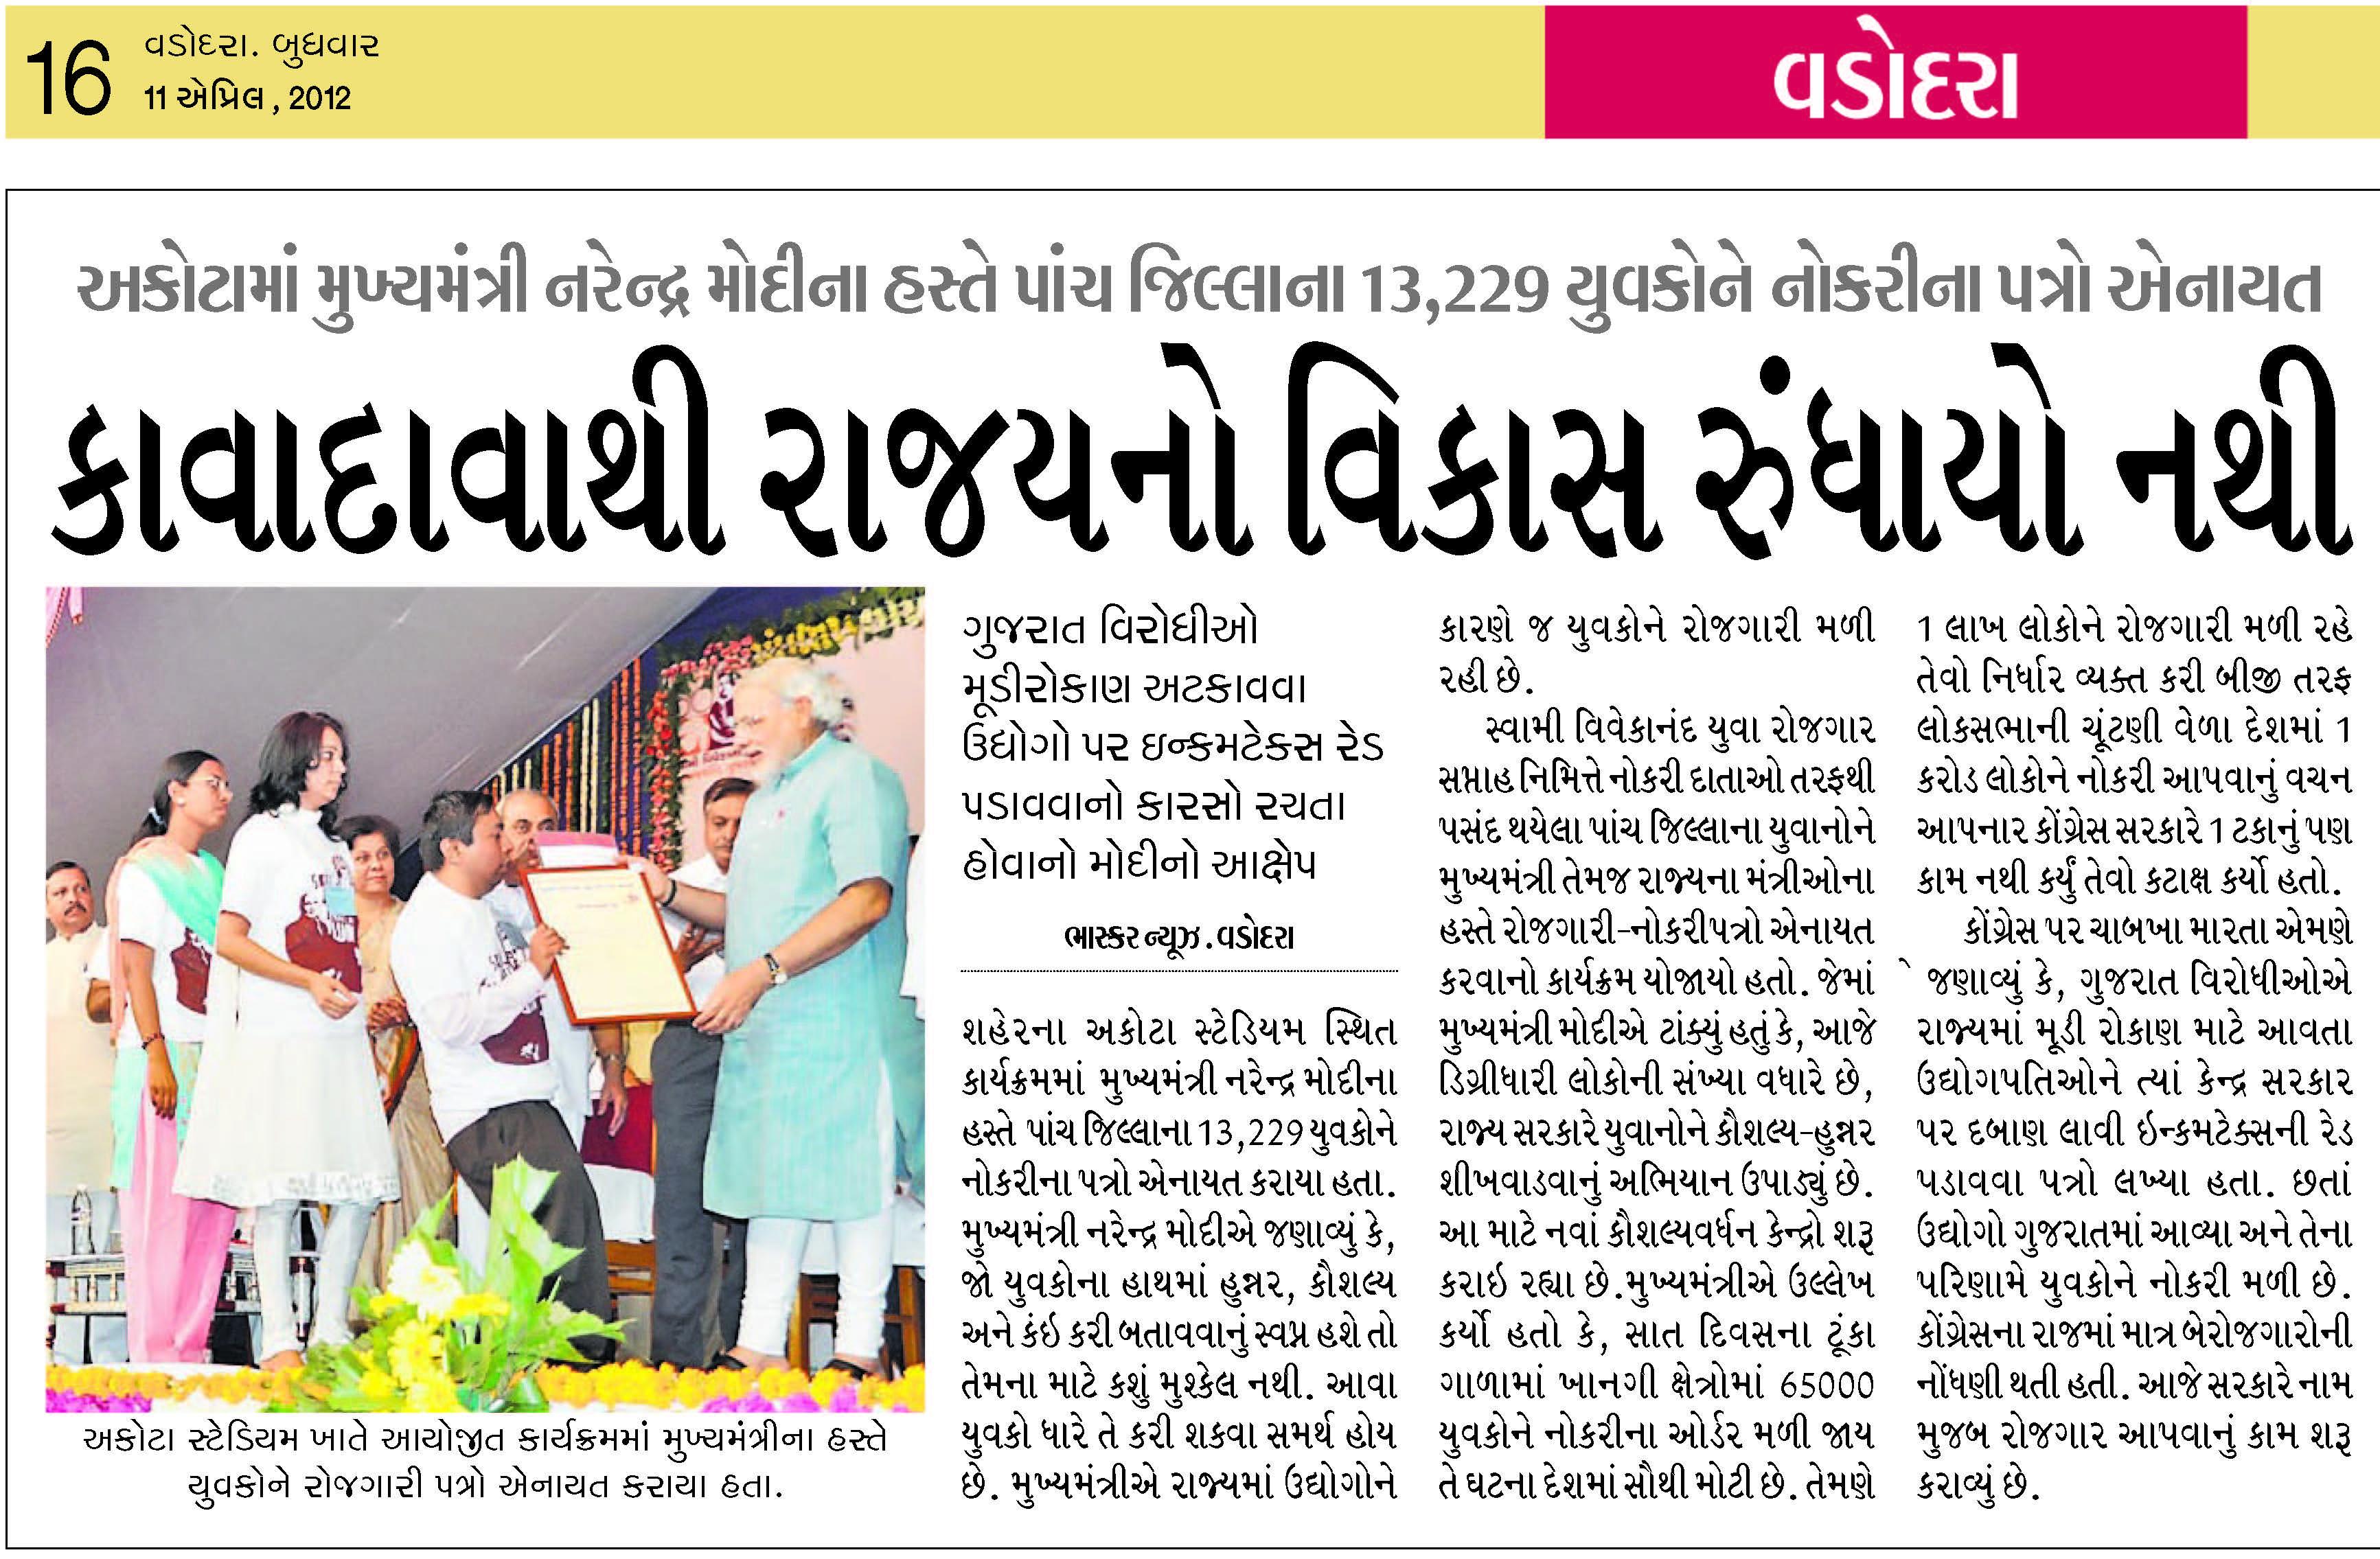 Gujarati newspapers and news sites